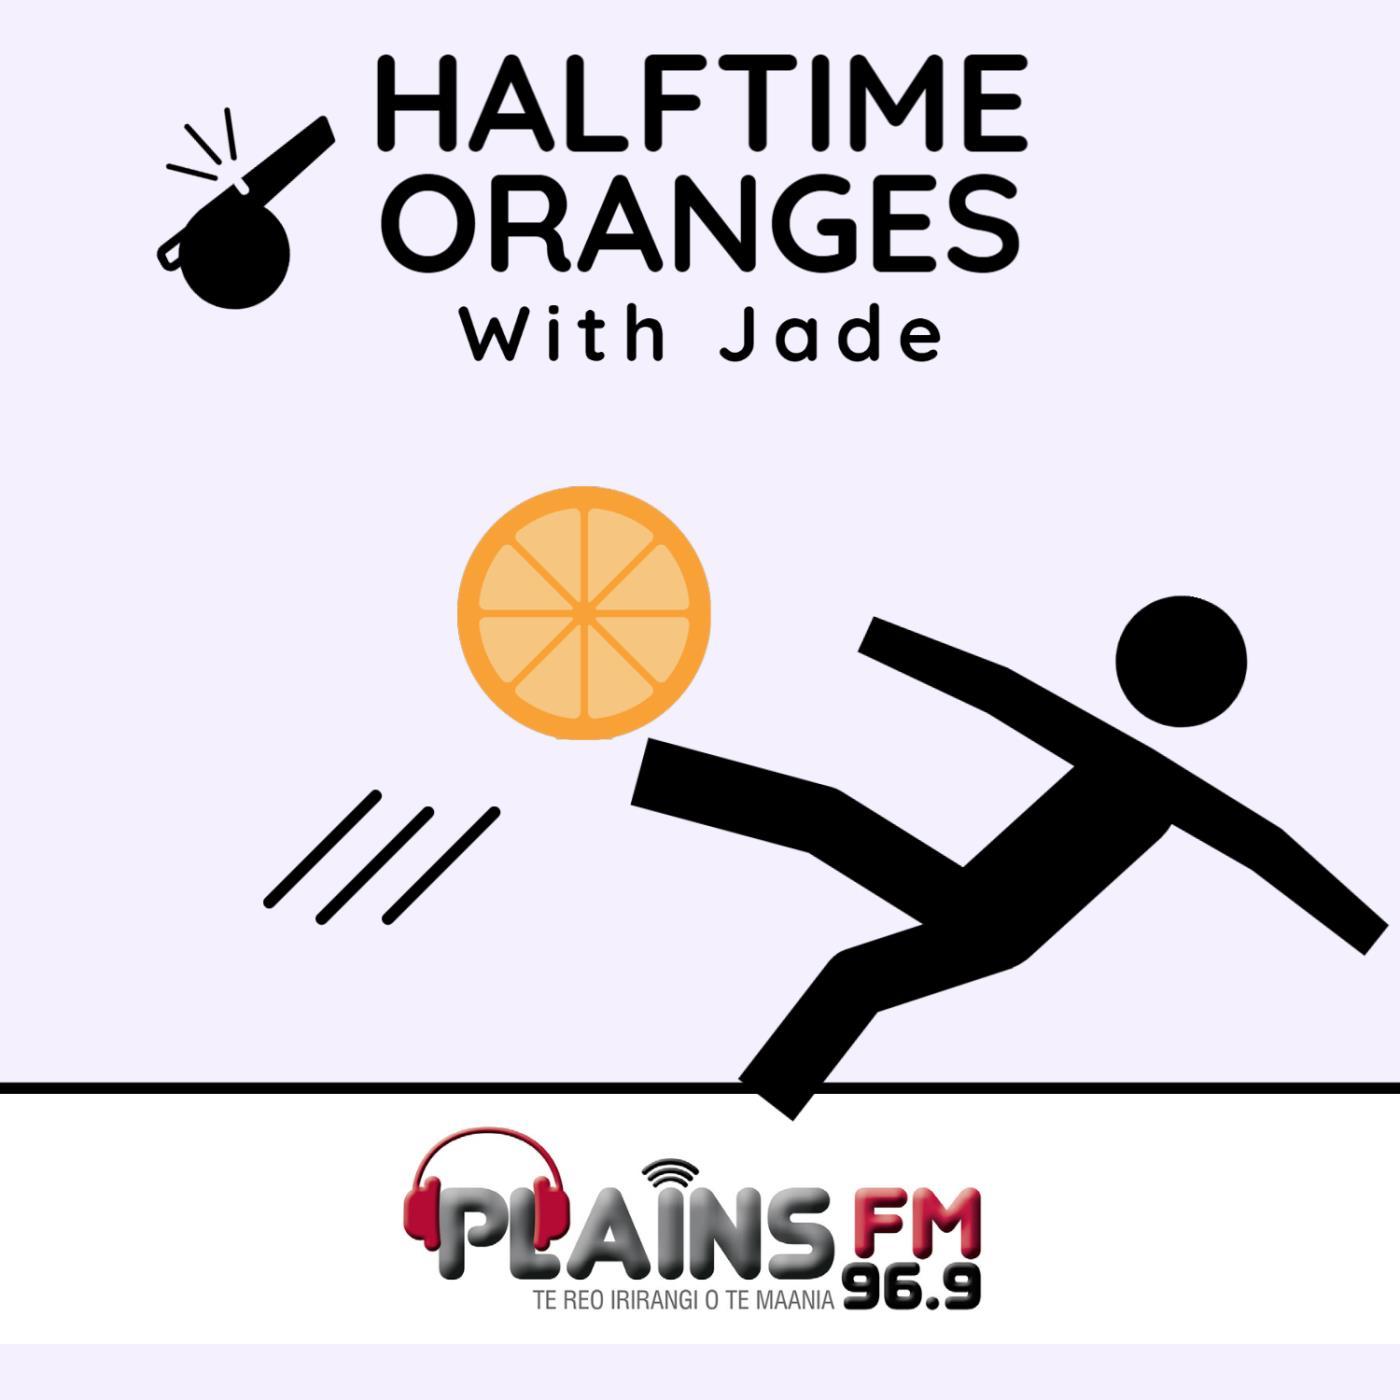 Half Time Oranges With Jade